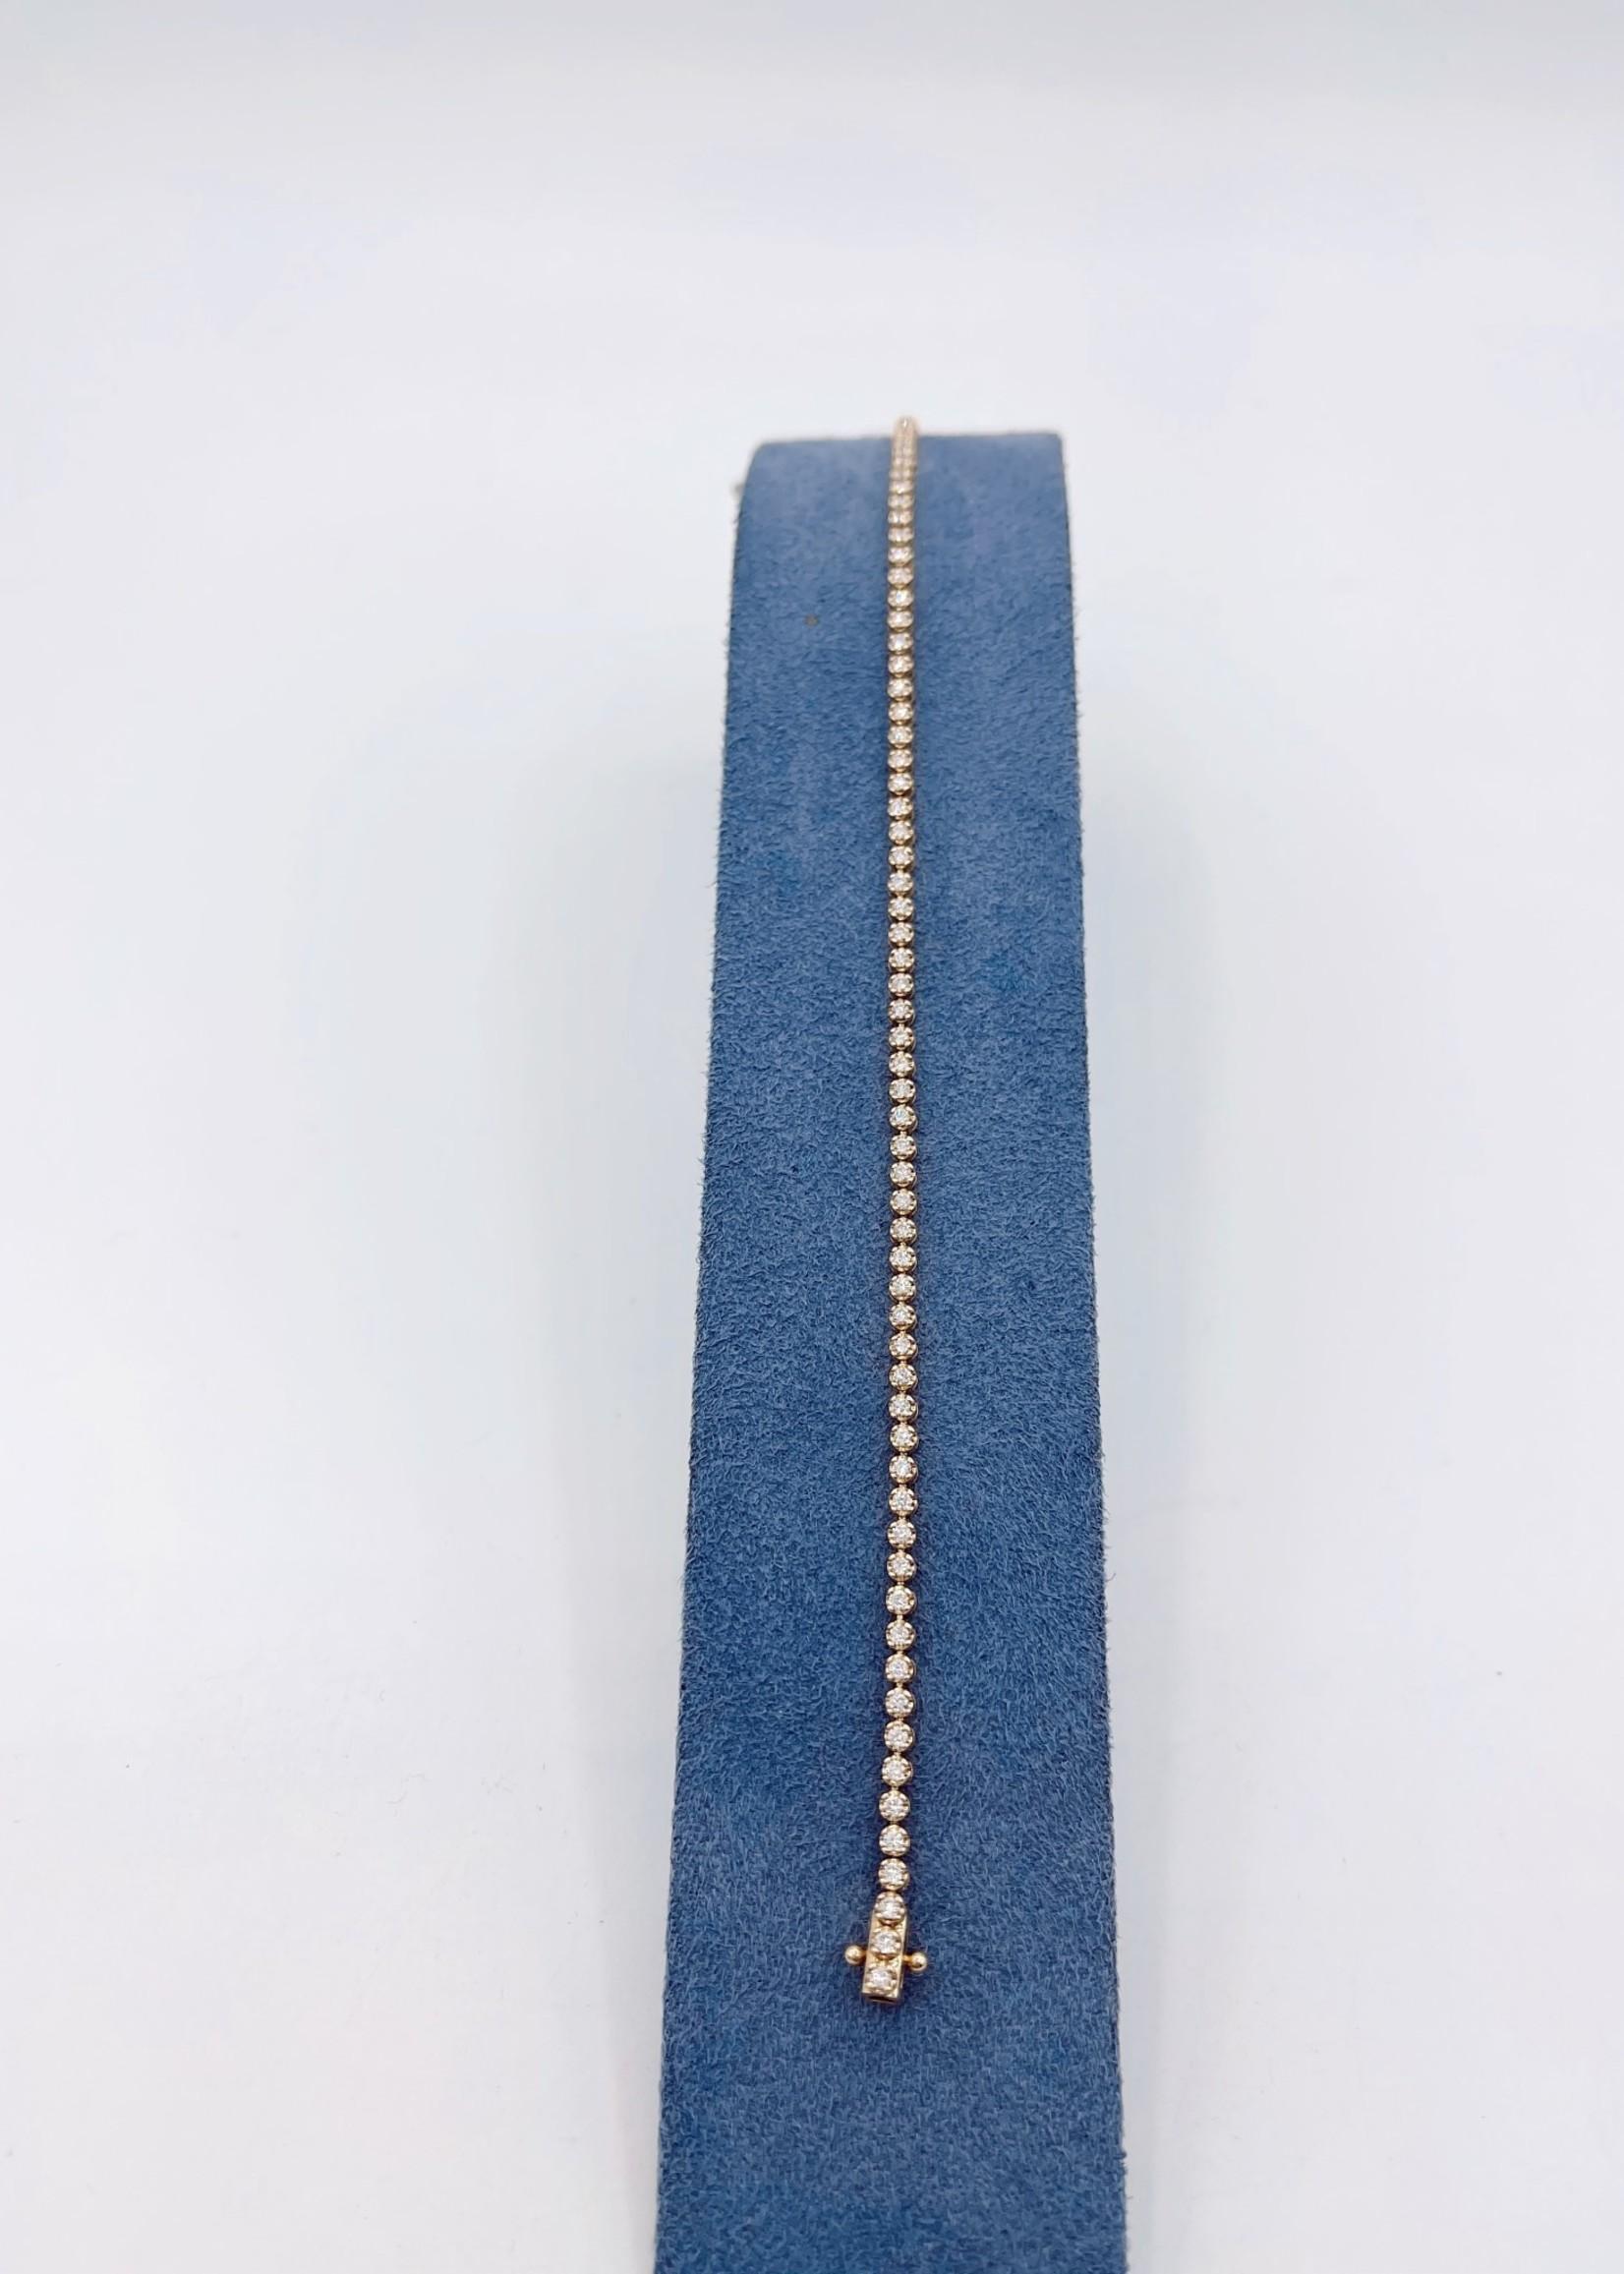 DSL Pearl 18K Y Gold Diamond Tennis Bracelet 1.05ct